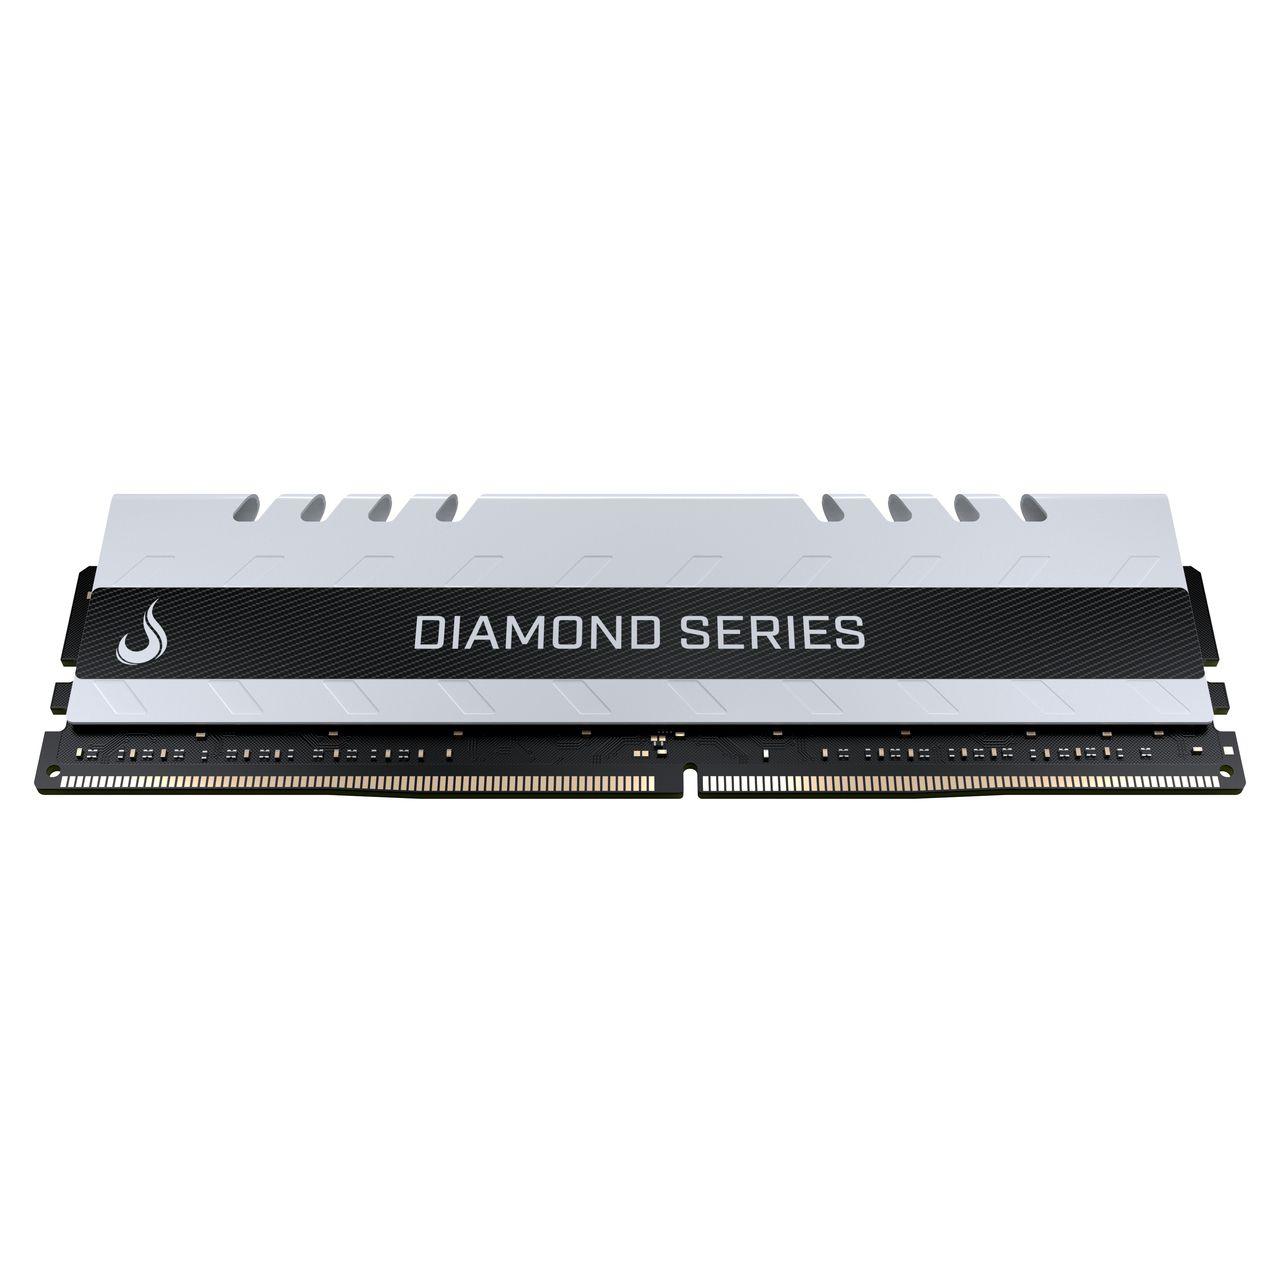 Memoria Ram DDR4 16GB 3000MHZ Diamond - RM-D4-16G-3000D WHITE  - Loja Rise Mode